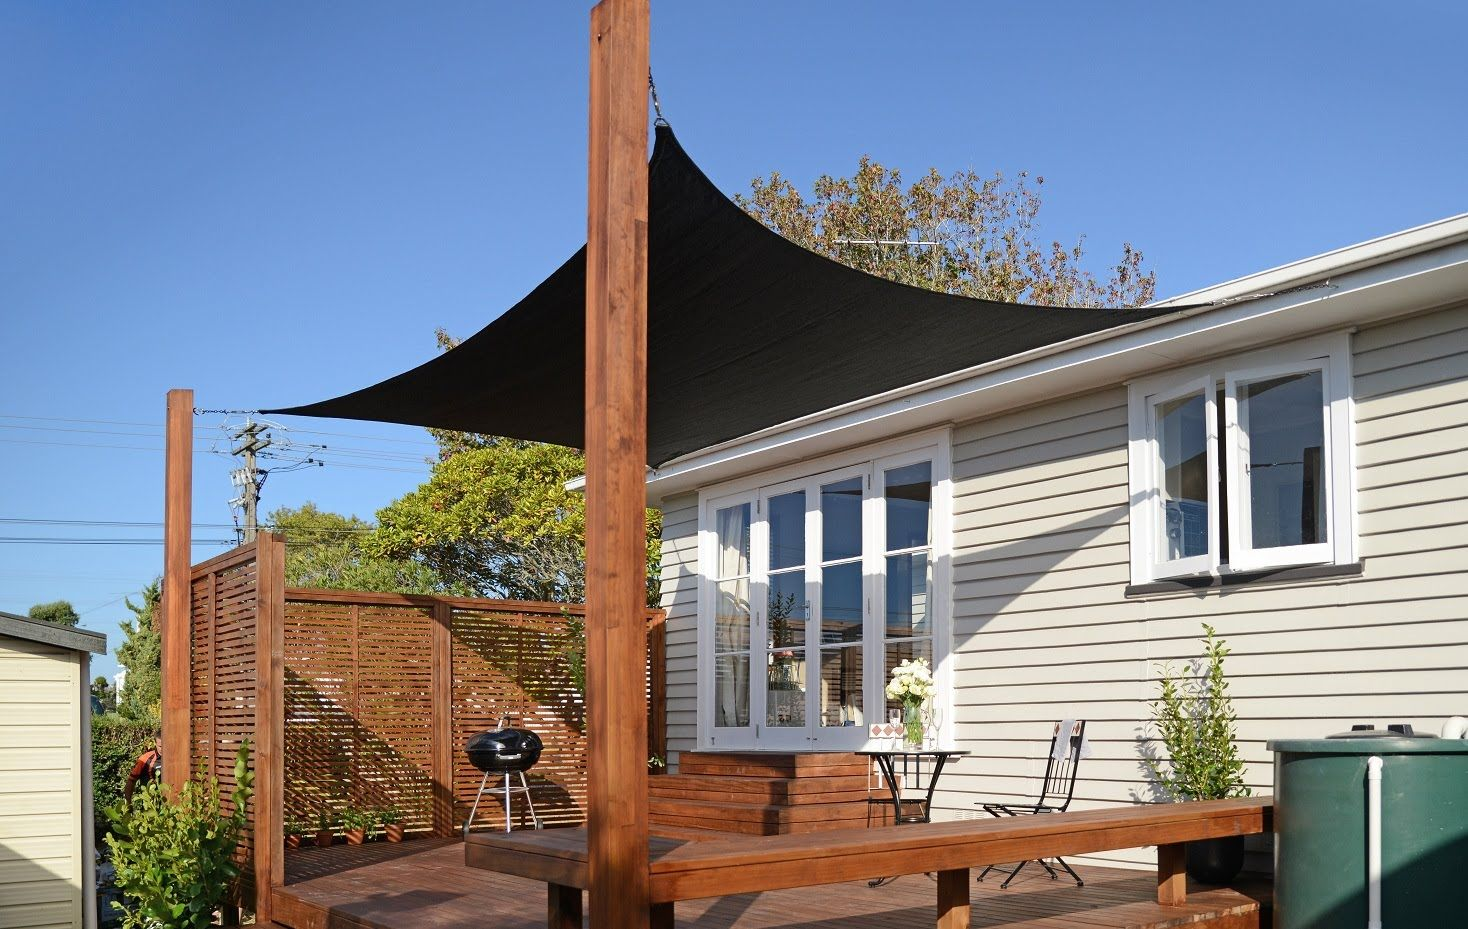 How To Put Up A Shade Sail Mitre 10 Easy As Backyard Shade Outdoor Shade Shade Sails Patio